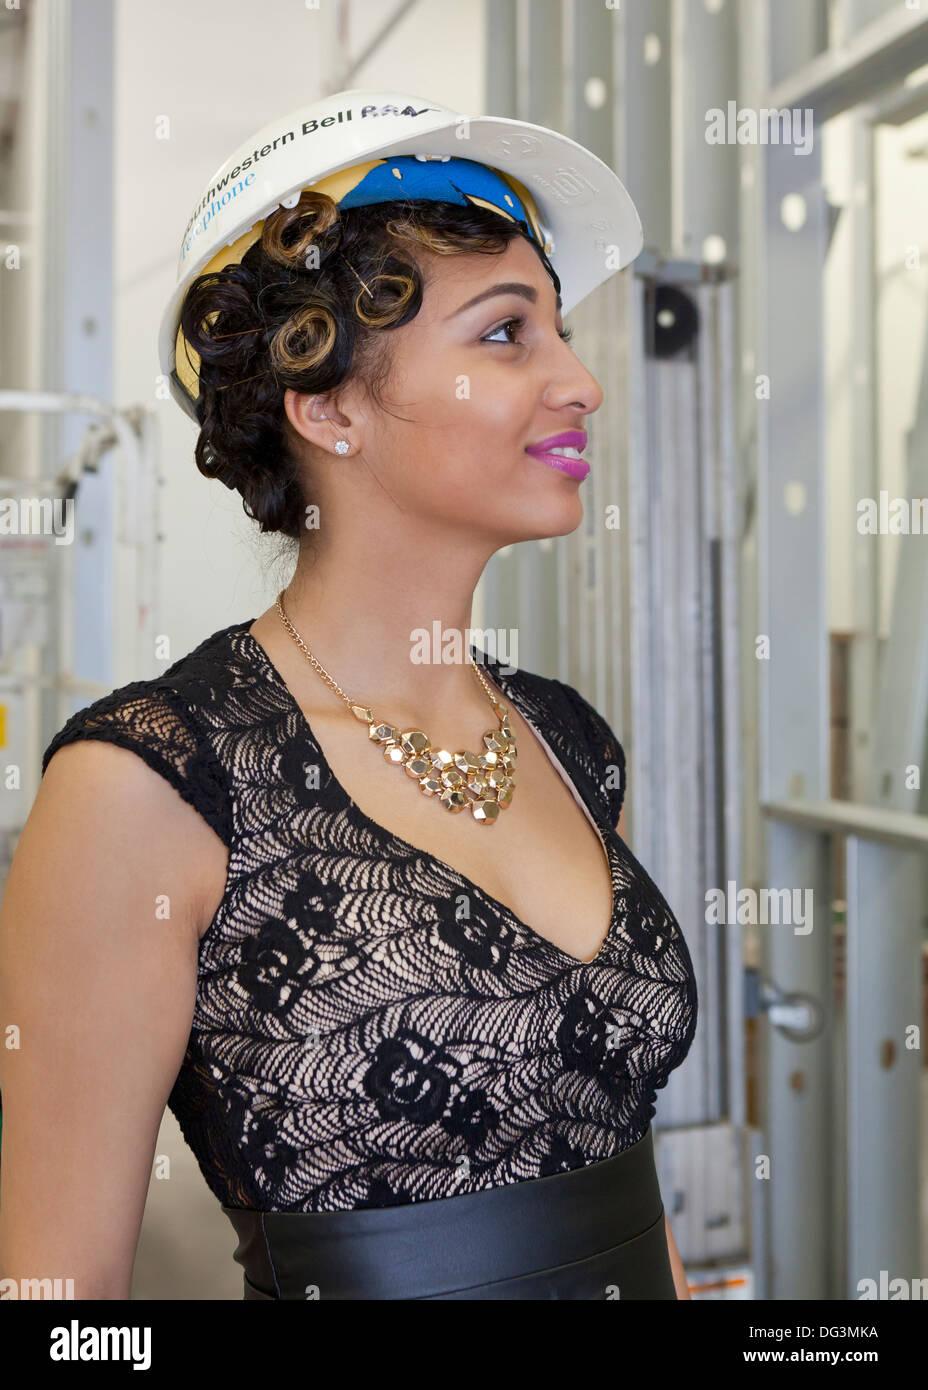 Weibliche Supervisor bei Baustelle - USA Stockbild